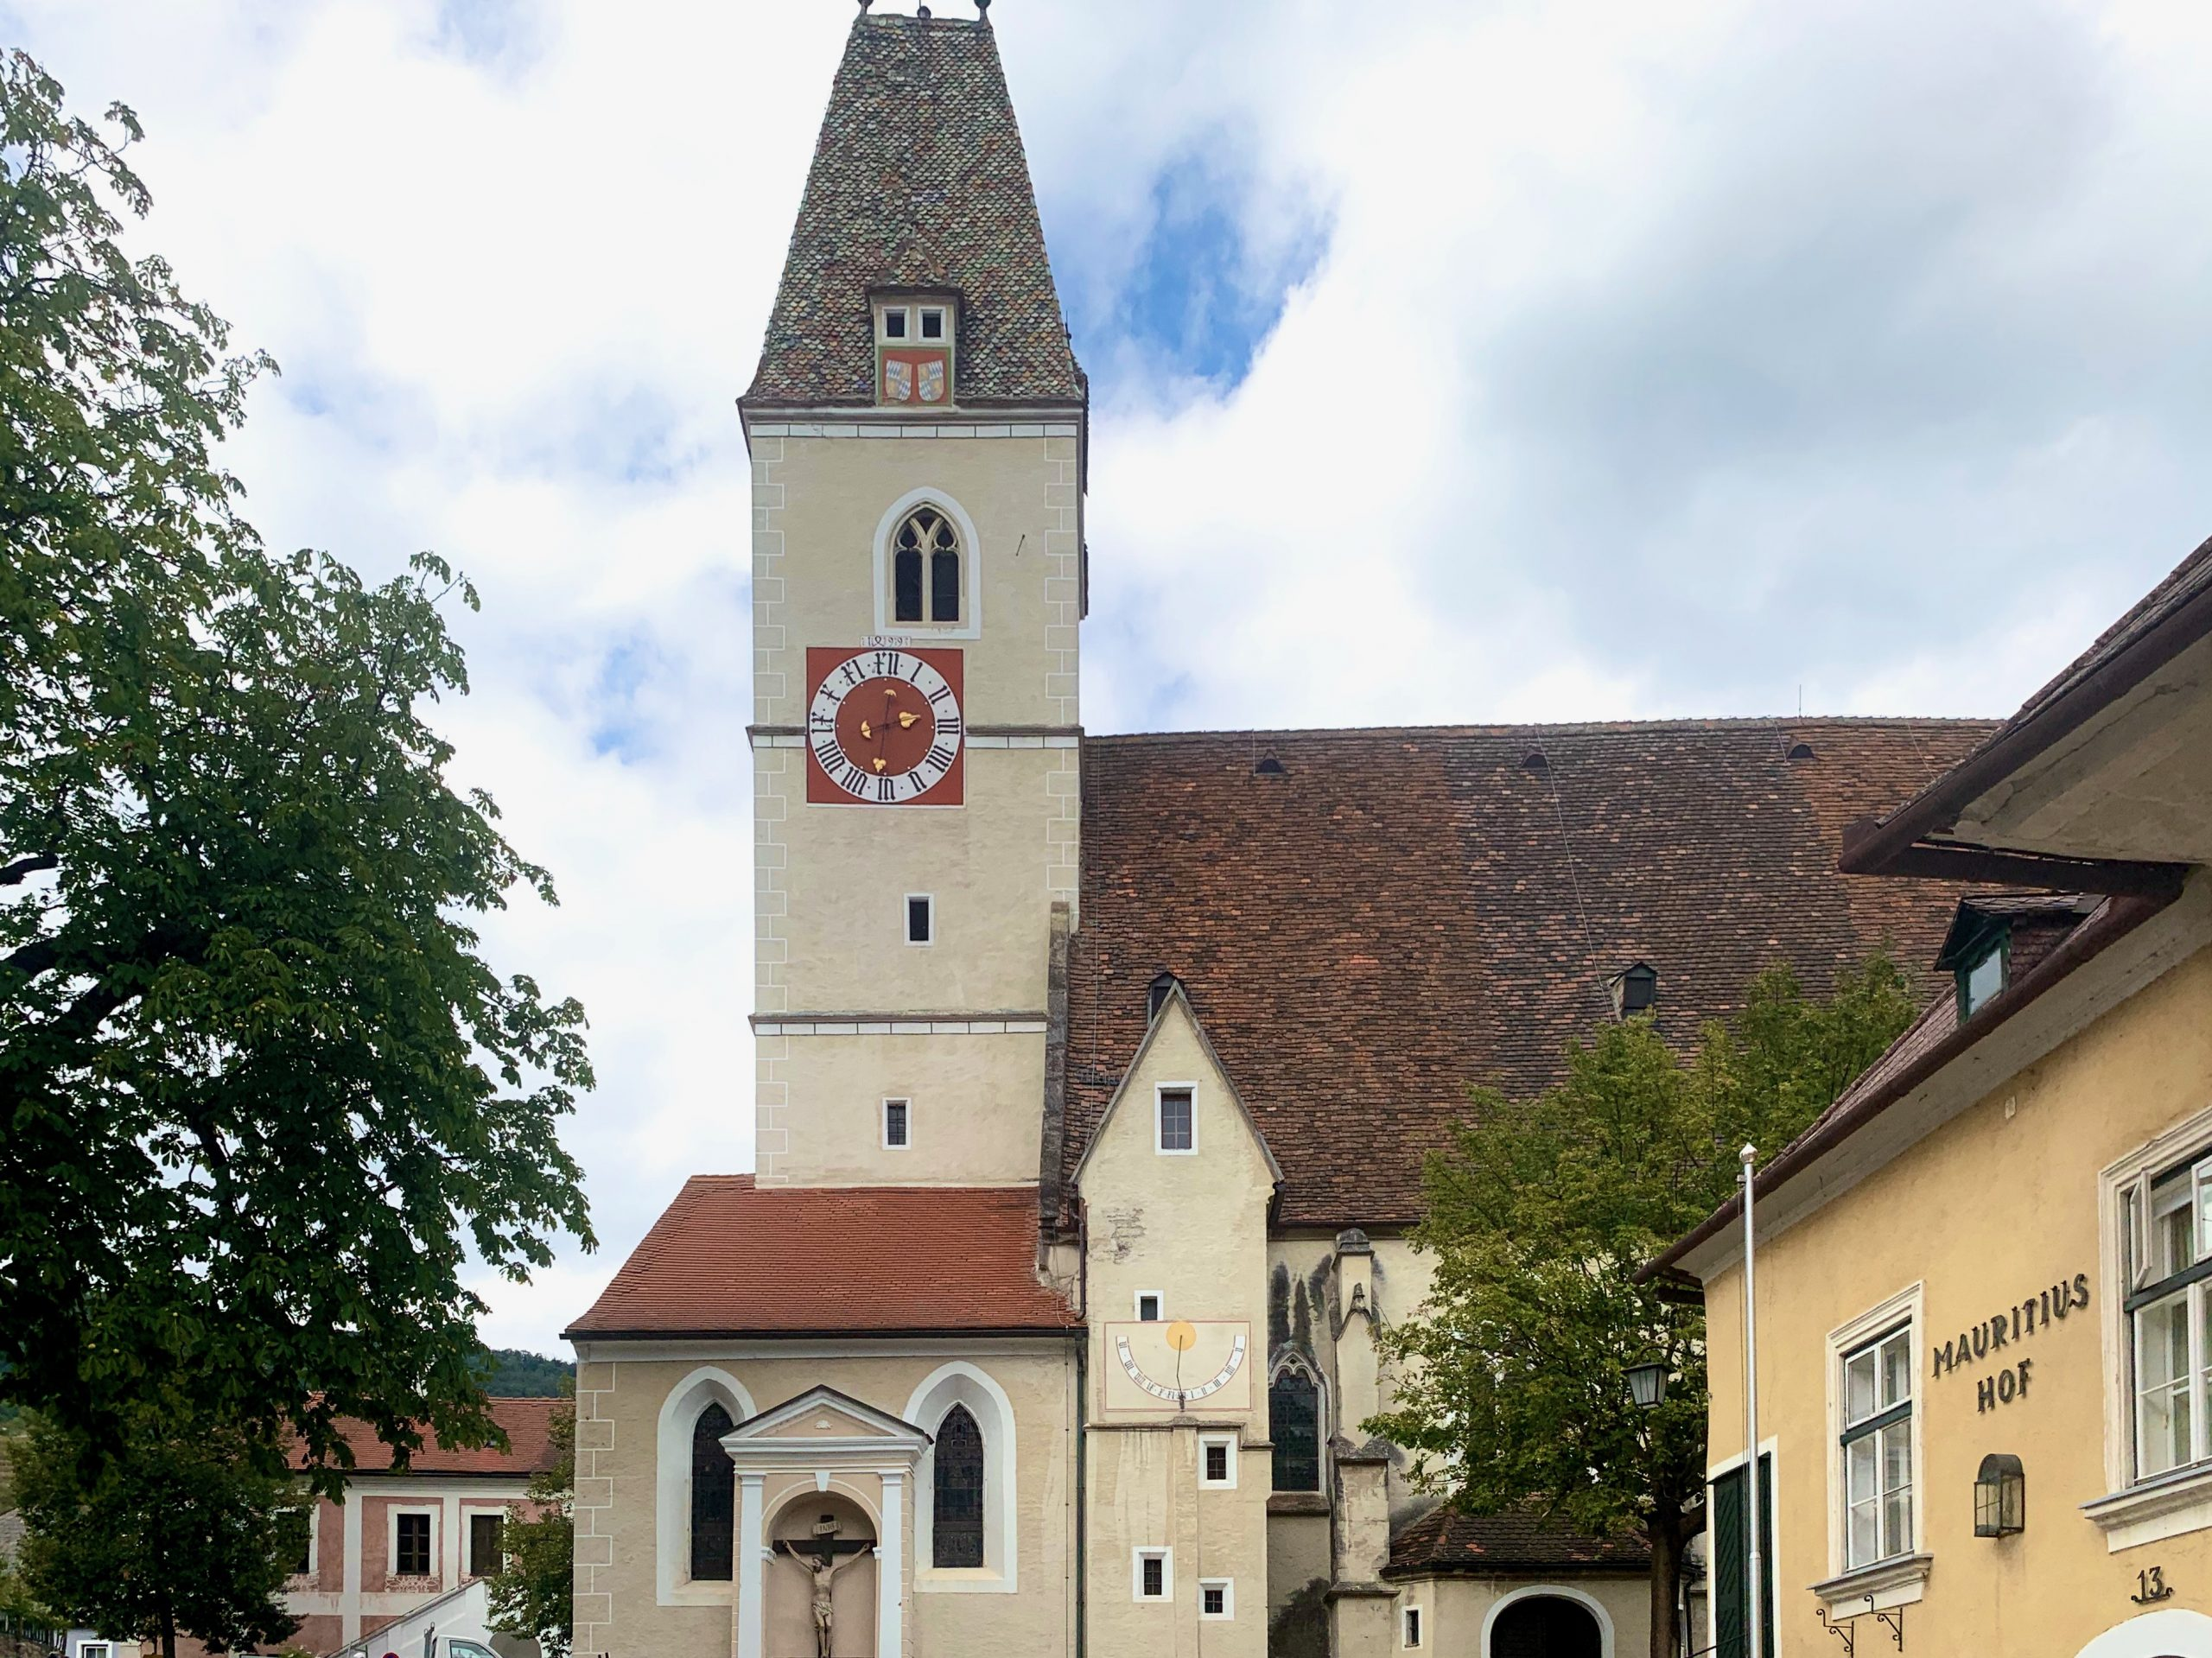 The Saint Mauritius Church in Spitz on the Danube